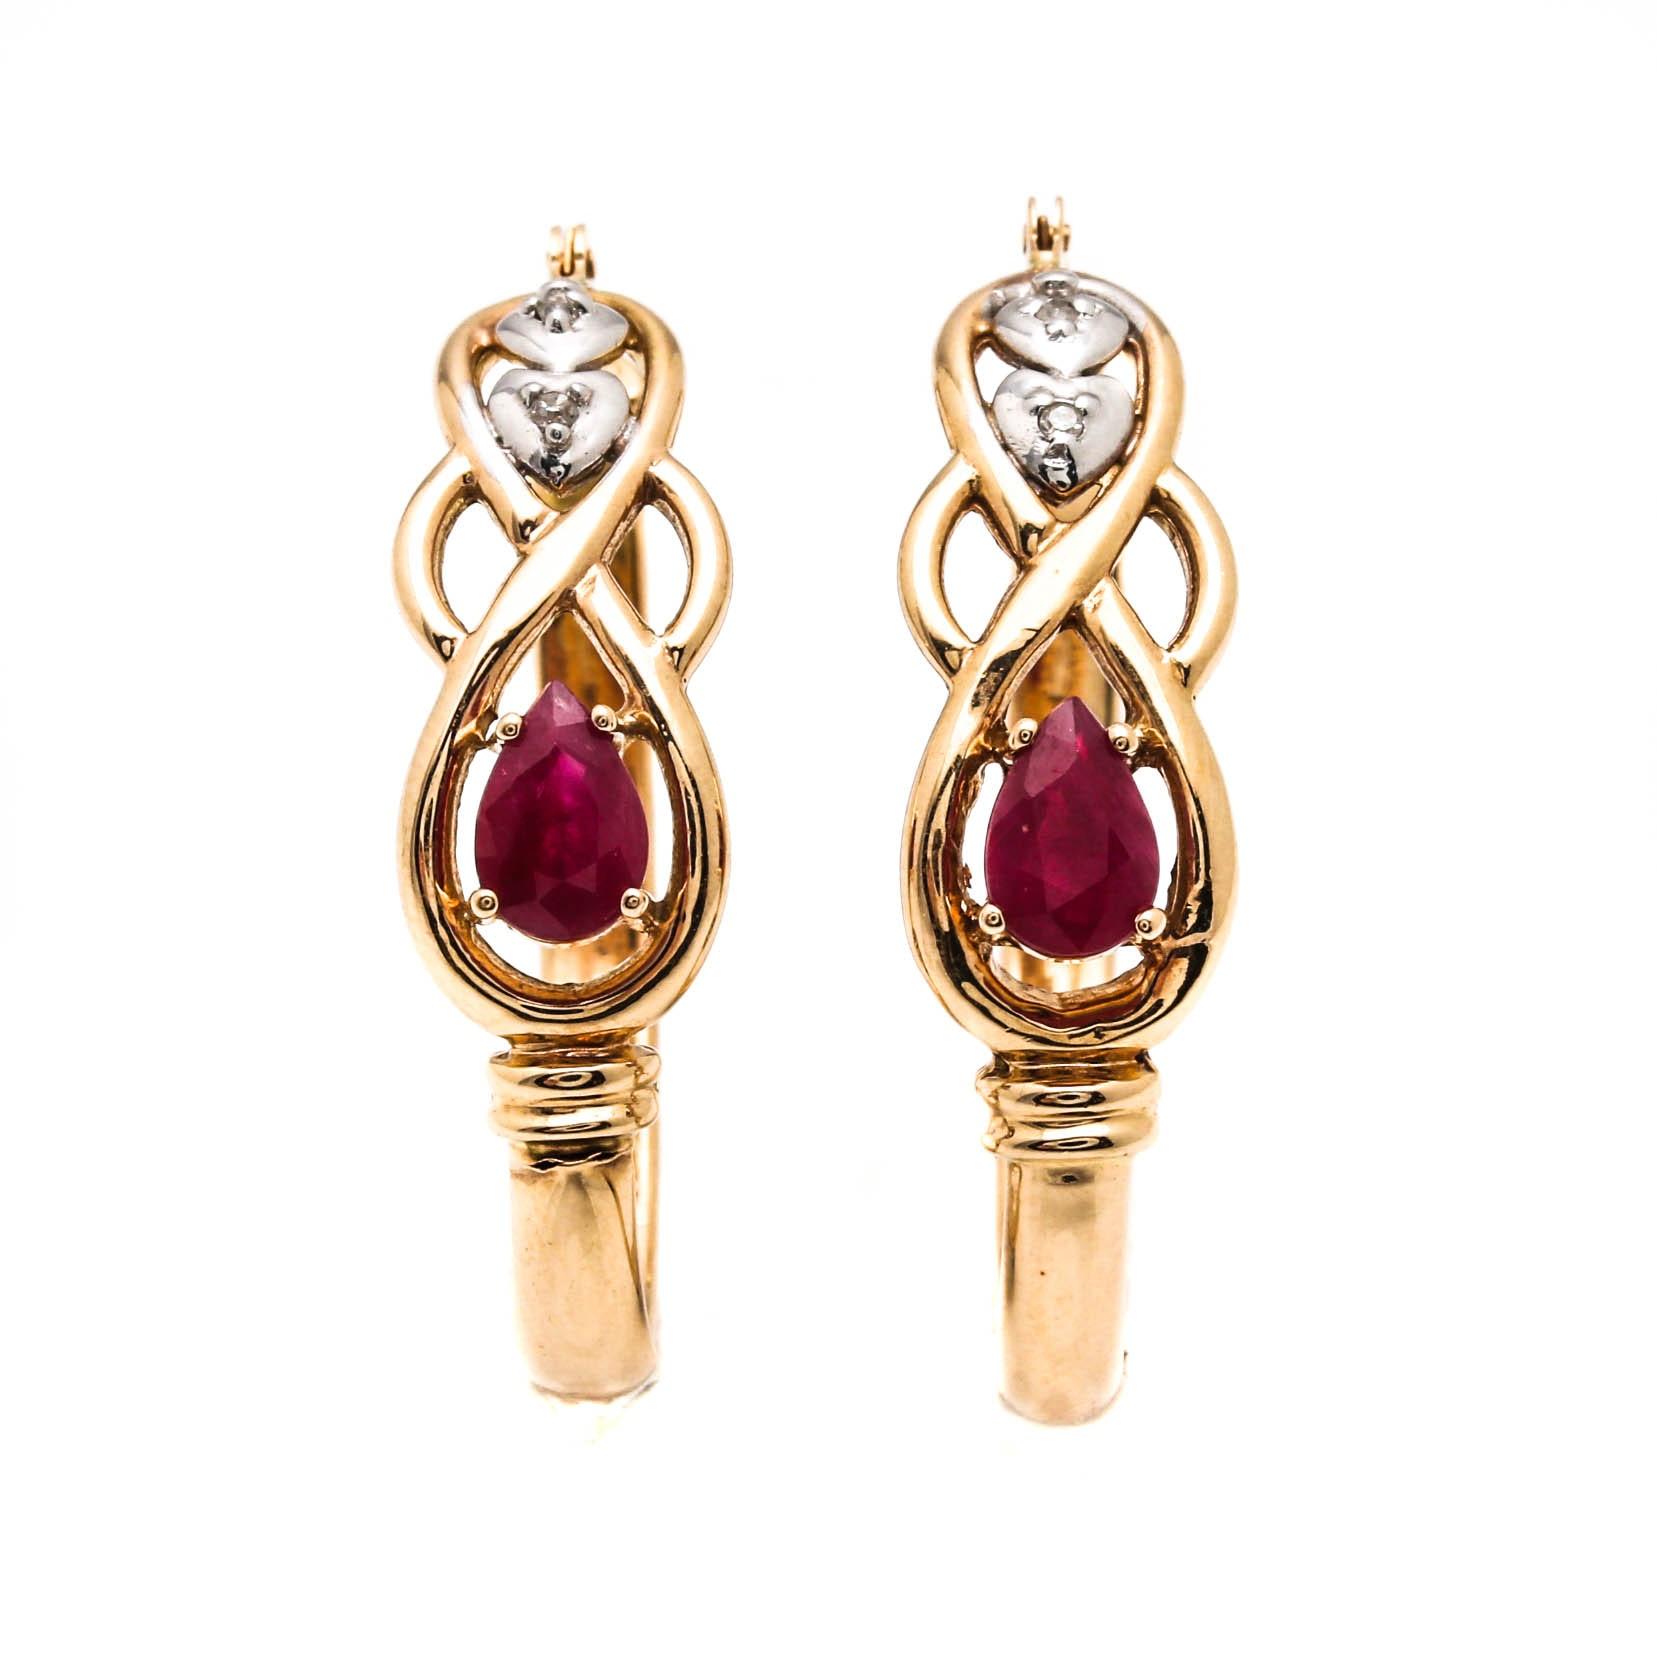 14K Yellow Gold Ruby and Diamond Hoop Earrings